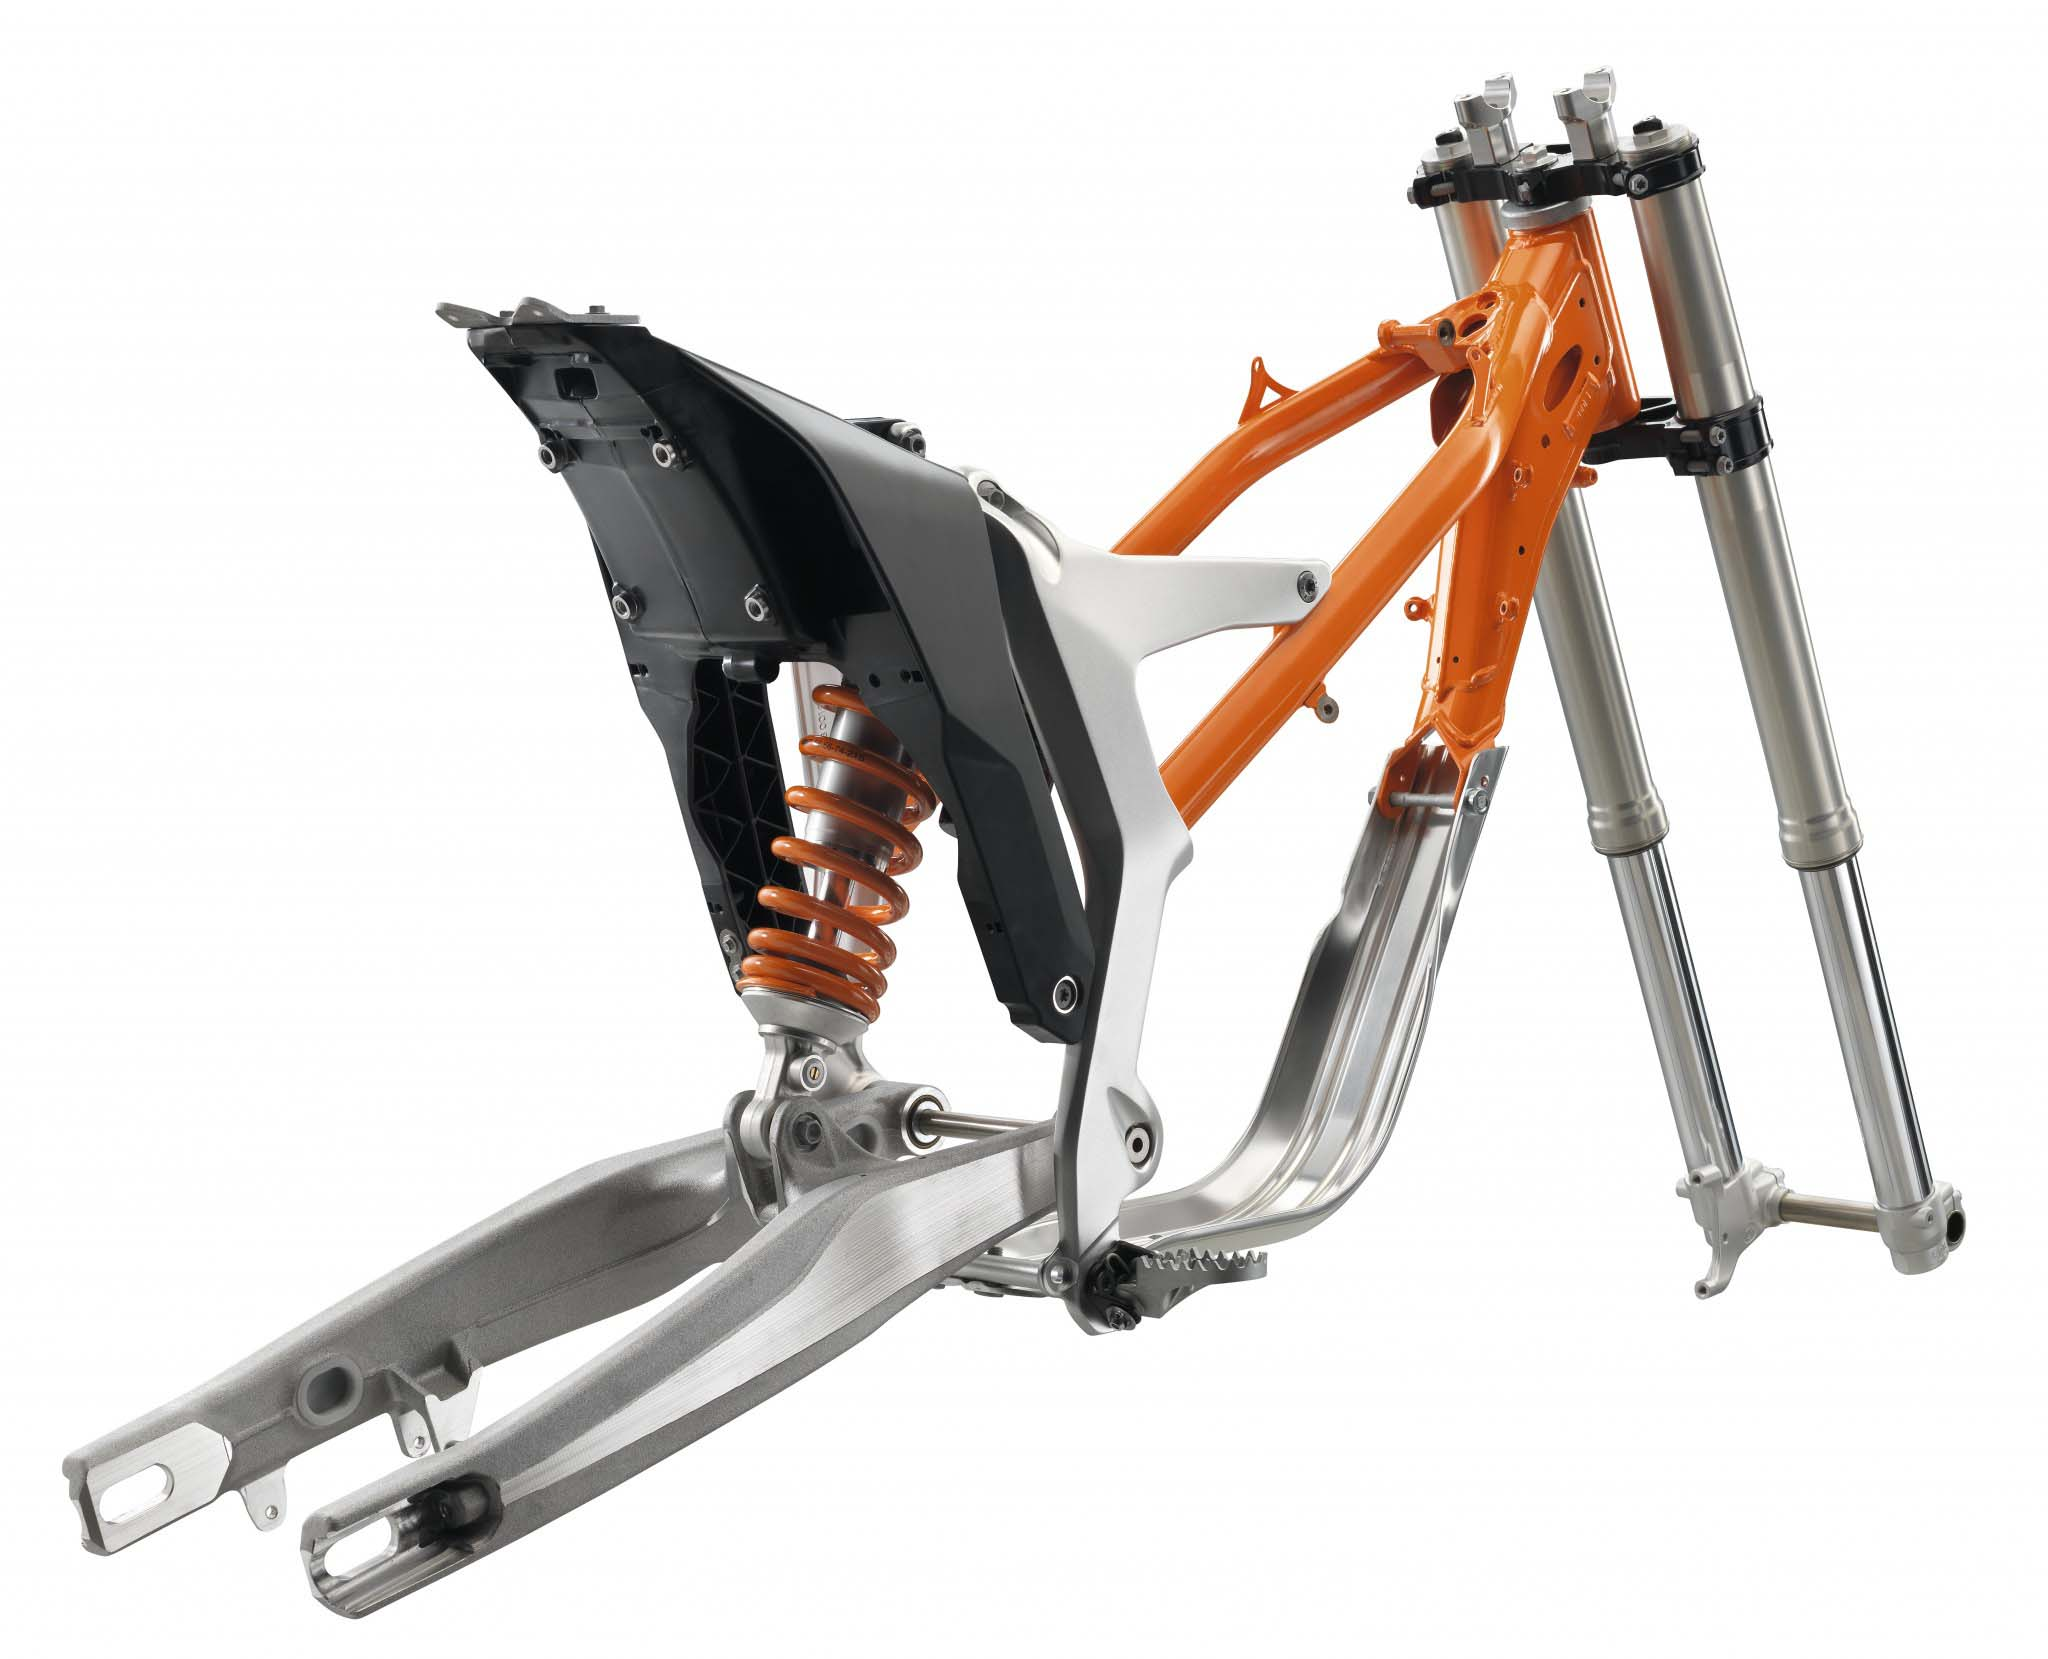 Ktm Freeride E Sm >> swingarm linkage design - Endless Sphere